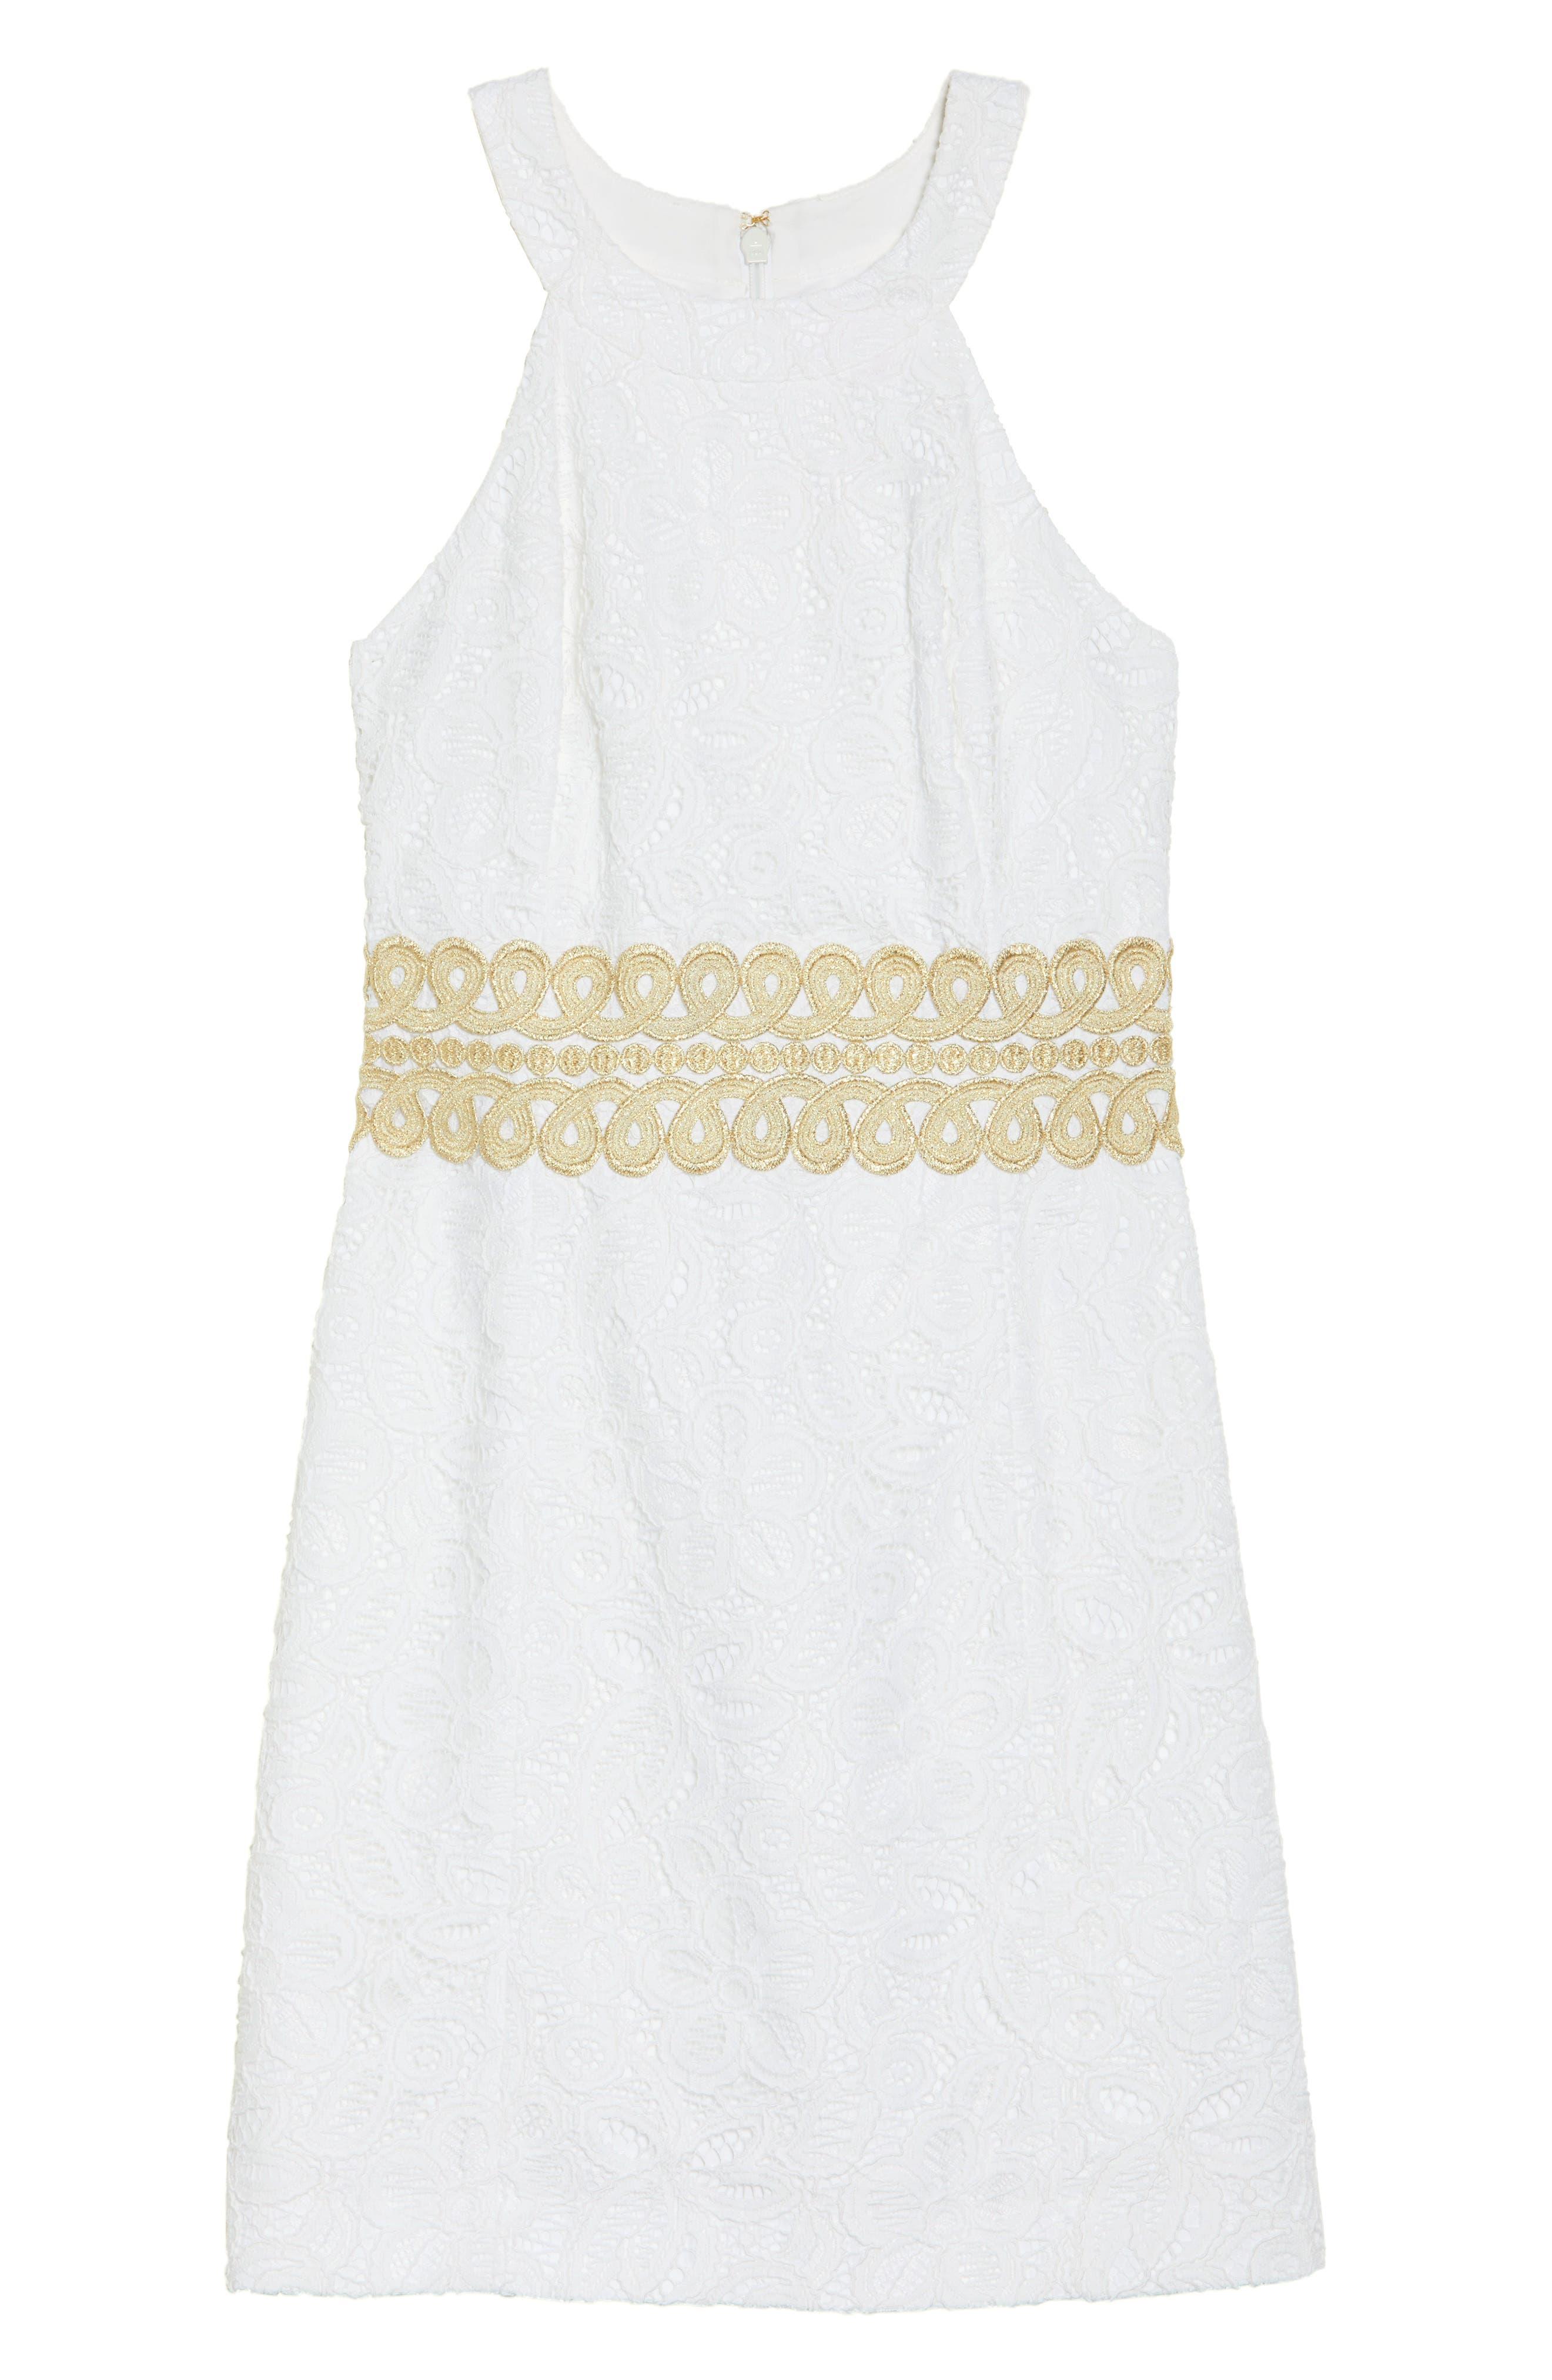 Ashlyn Lace Dress,                             Alternate thumbnail 7, color,                             RESORT WHITE POP FLORAL LACE